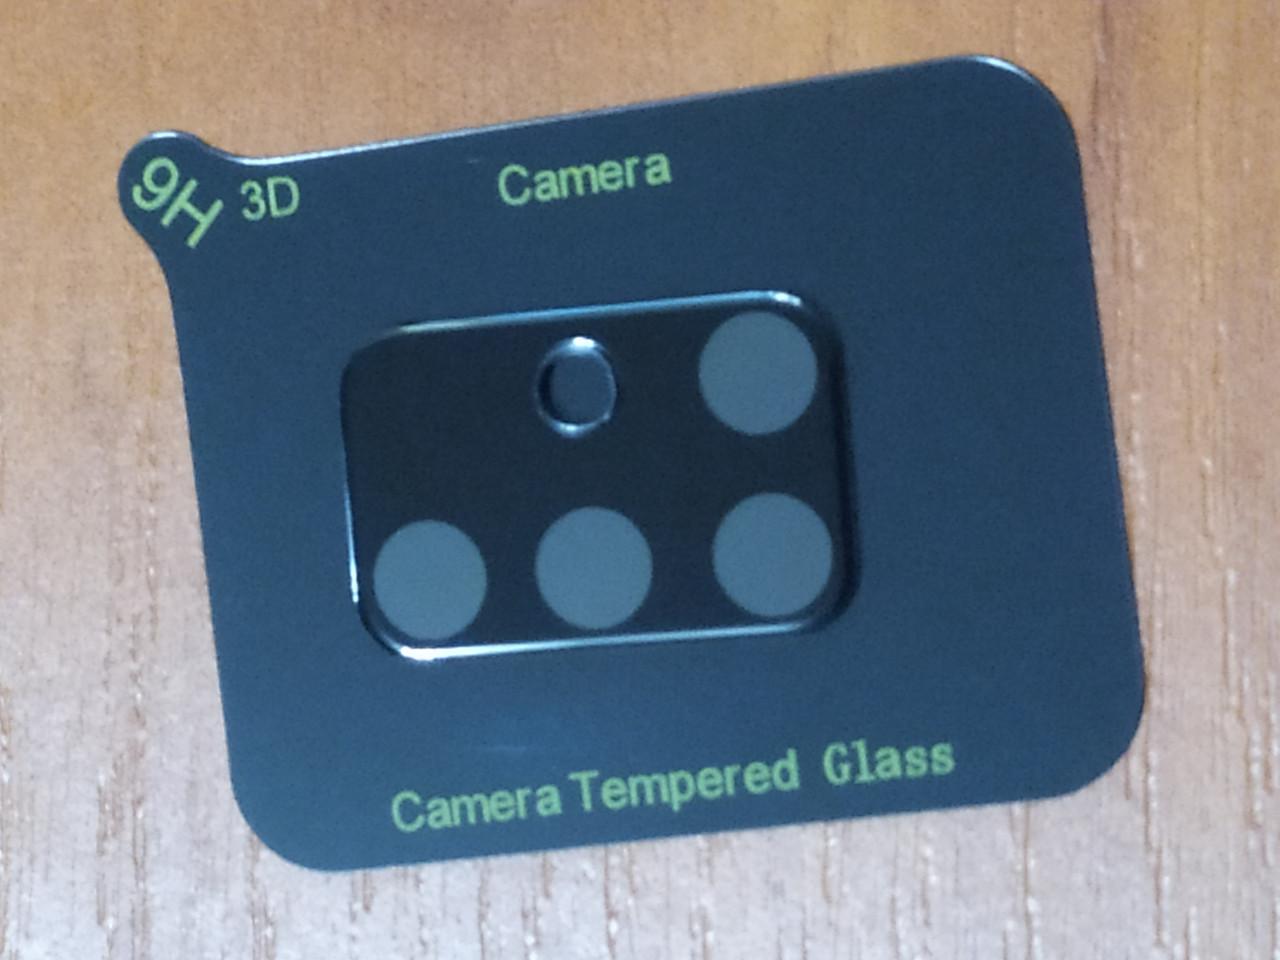 Стекло на камеру Camera  Tempered Glass 3D / 9H  Samsung  A51   2020  (черное)